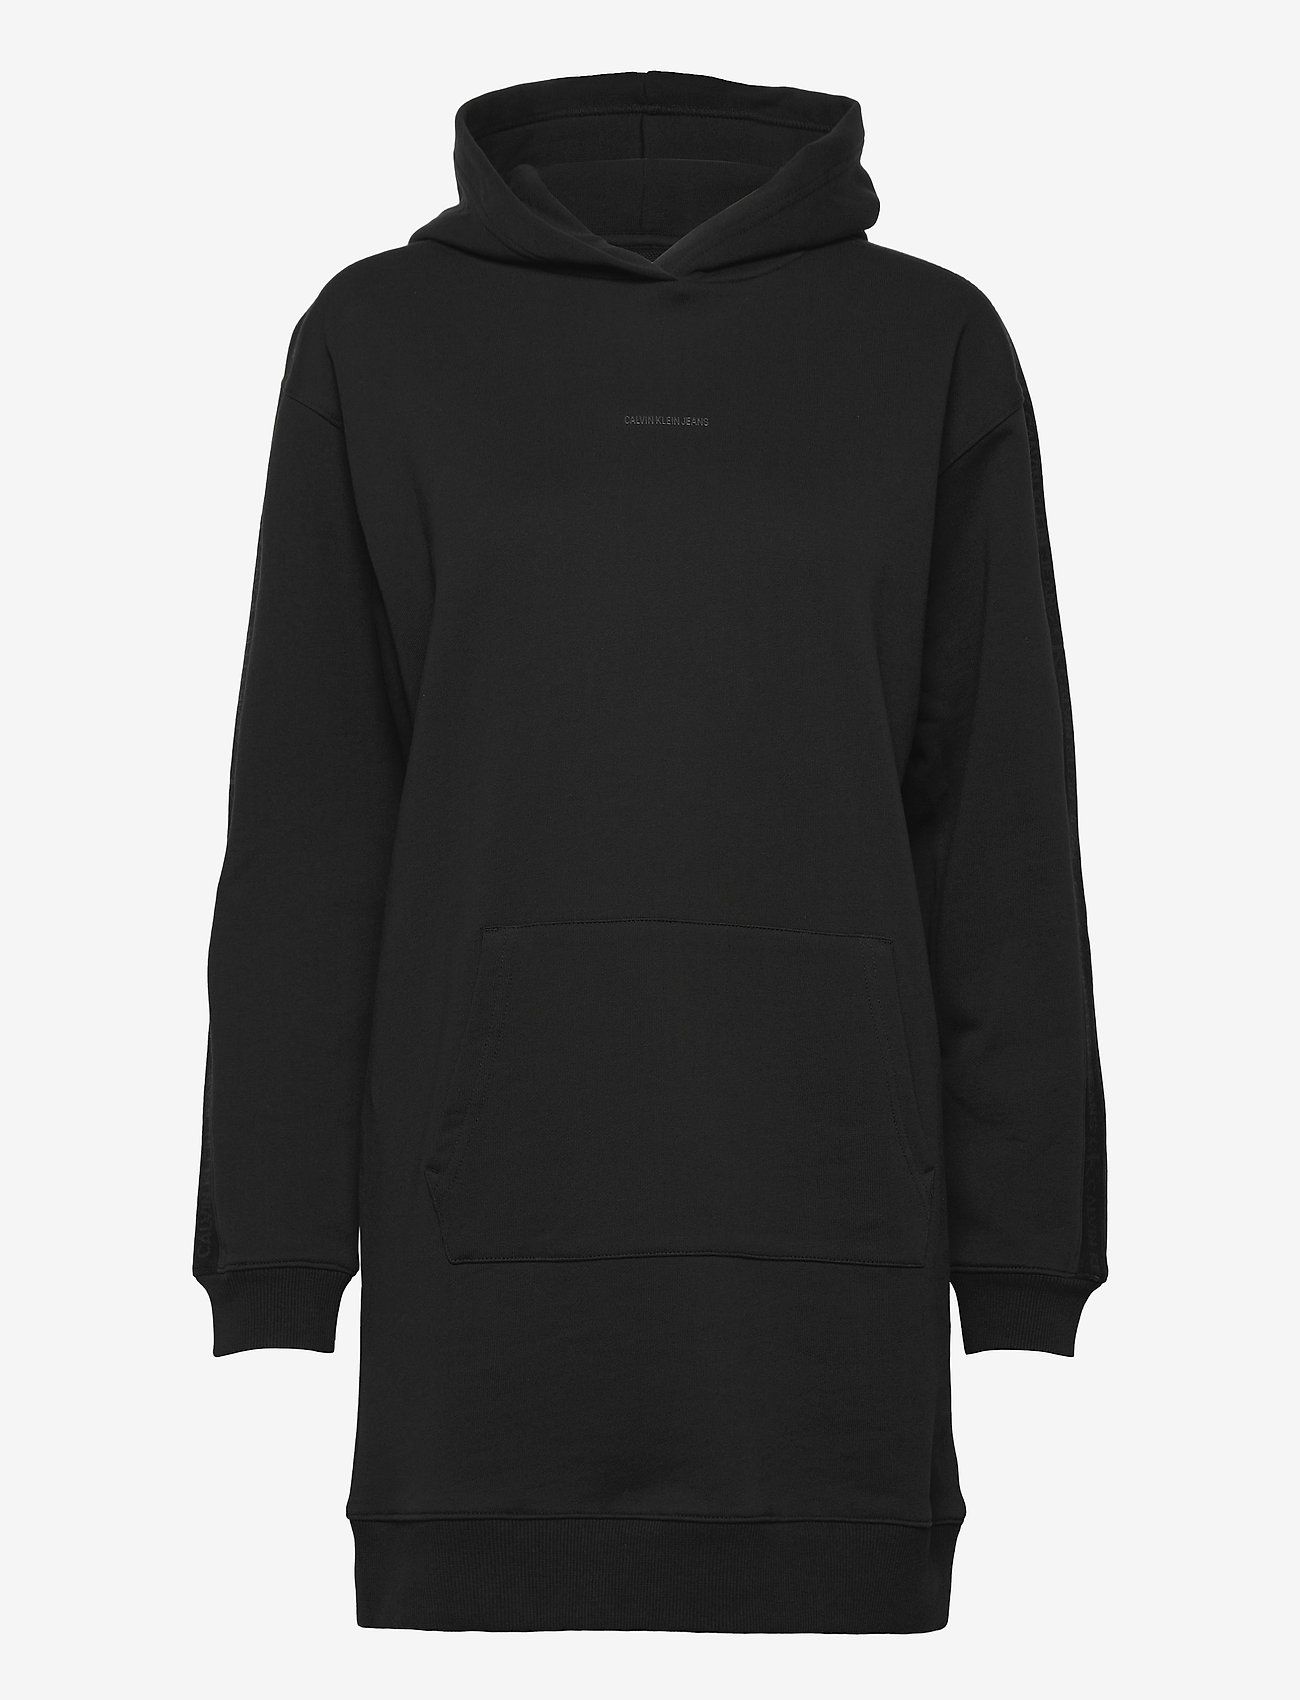 Calvin Klein Jeans - LOGO TRIM HOODIE DRESS - hverdagskjoler - ck black - 0